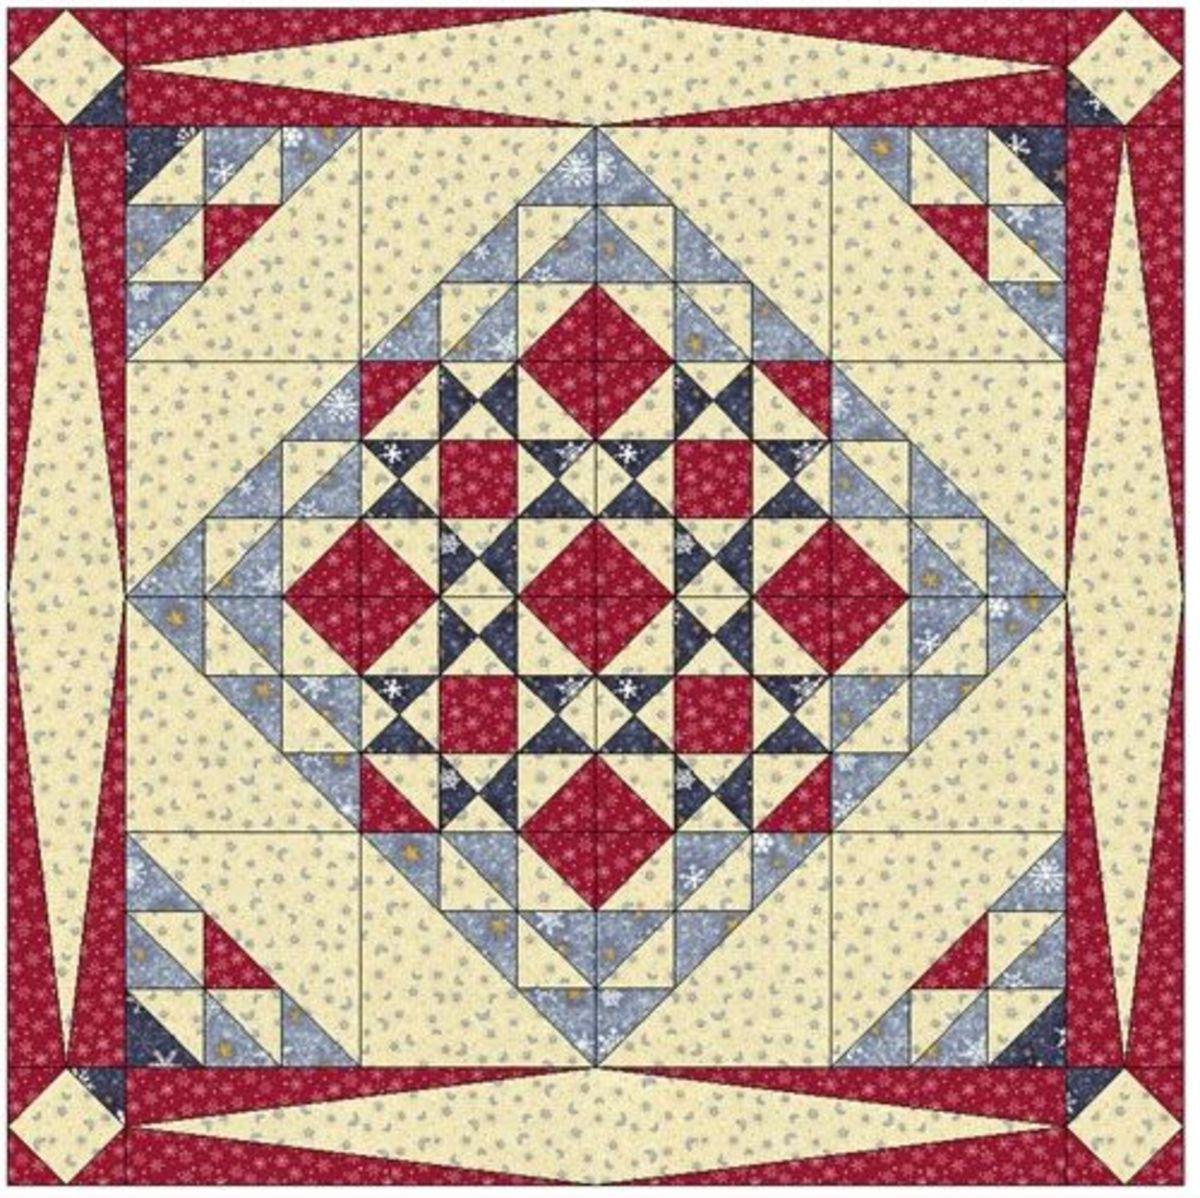 Quilt layout/design